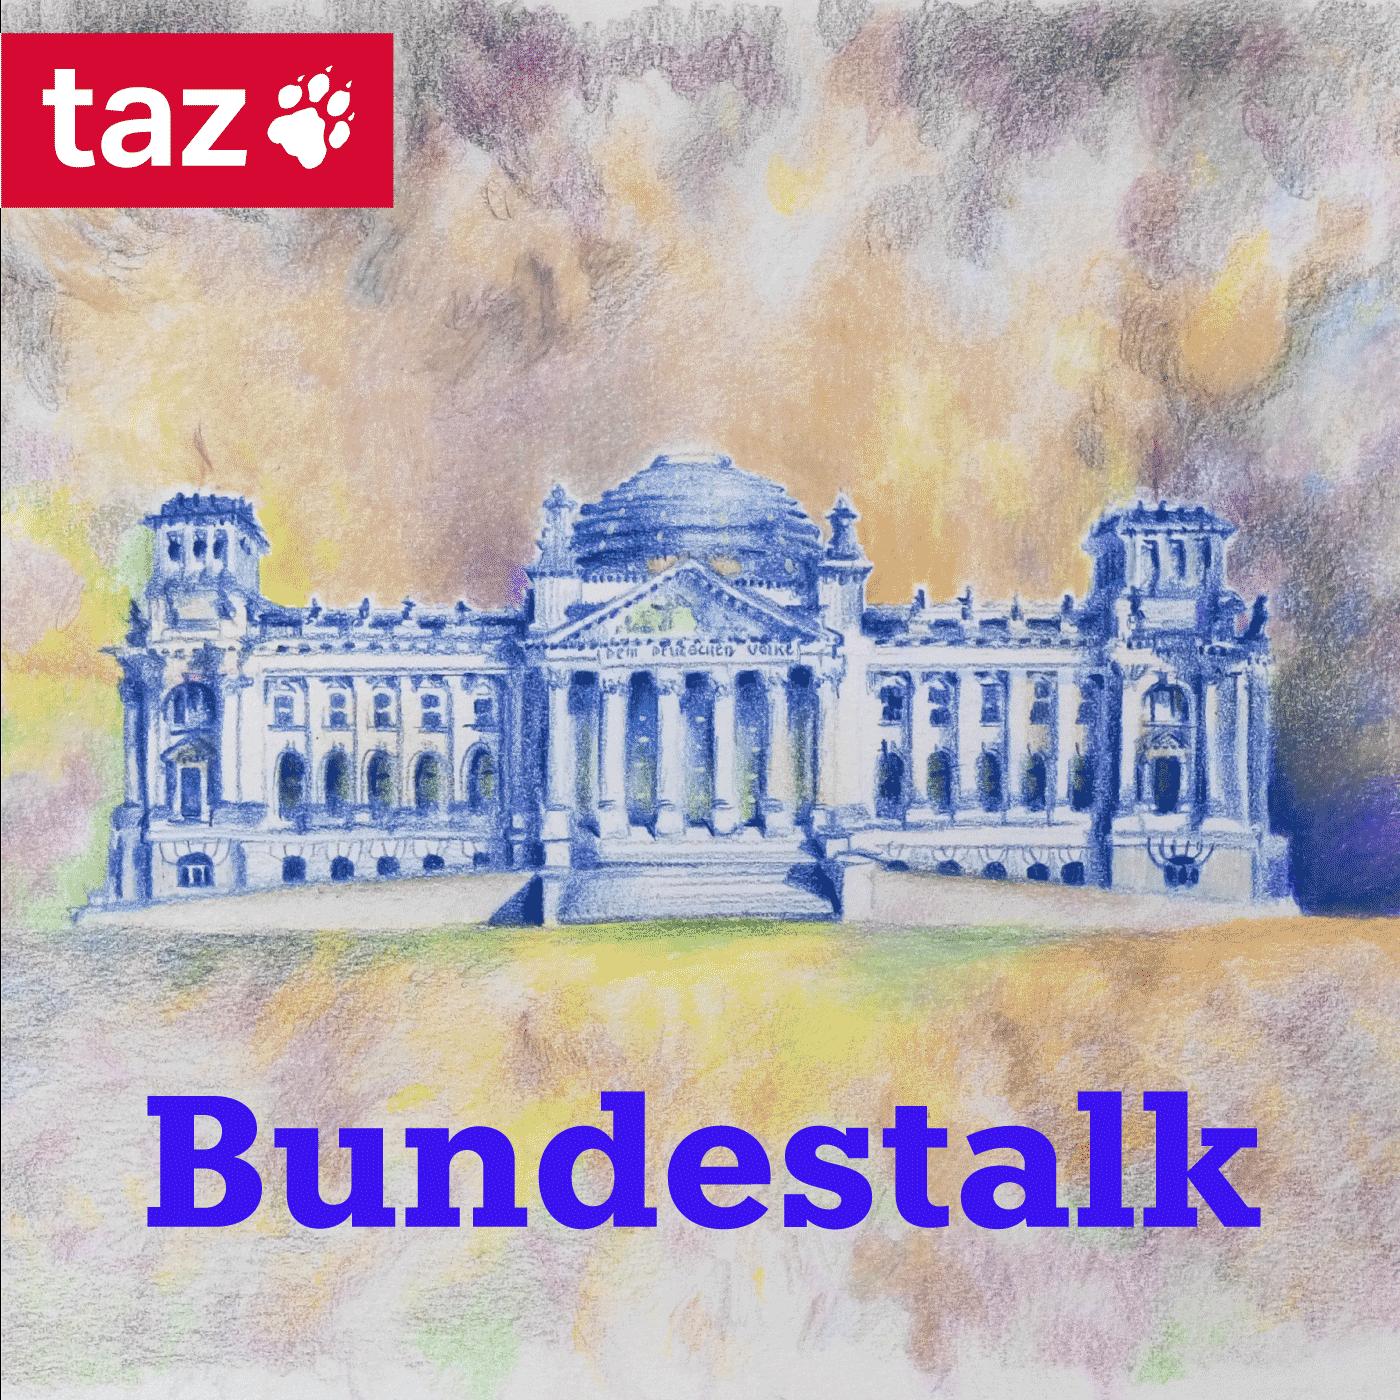 Bundestalk - Der Parlamentspodcast der taz